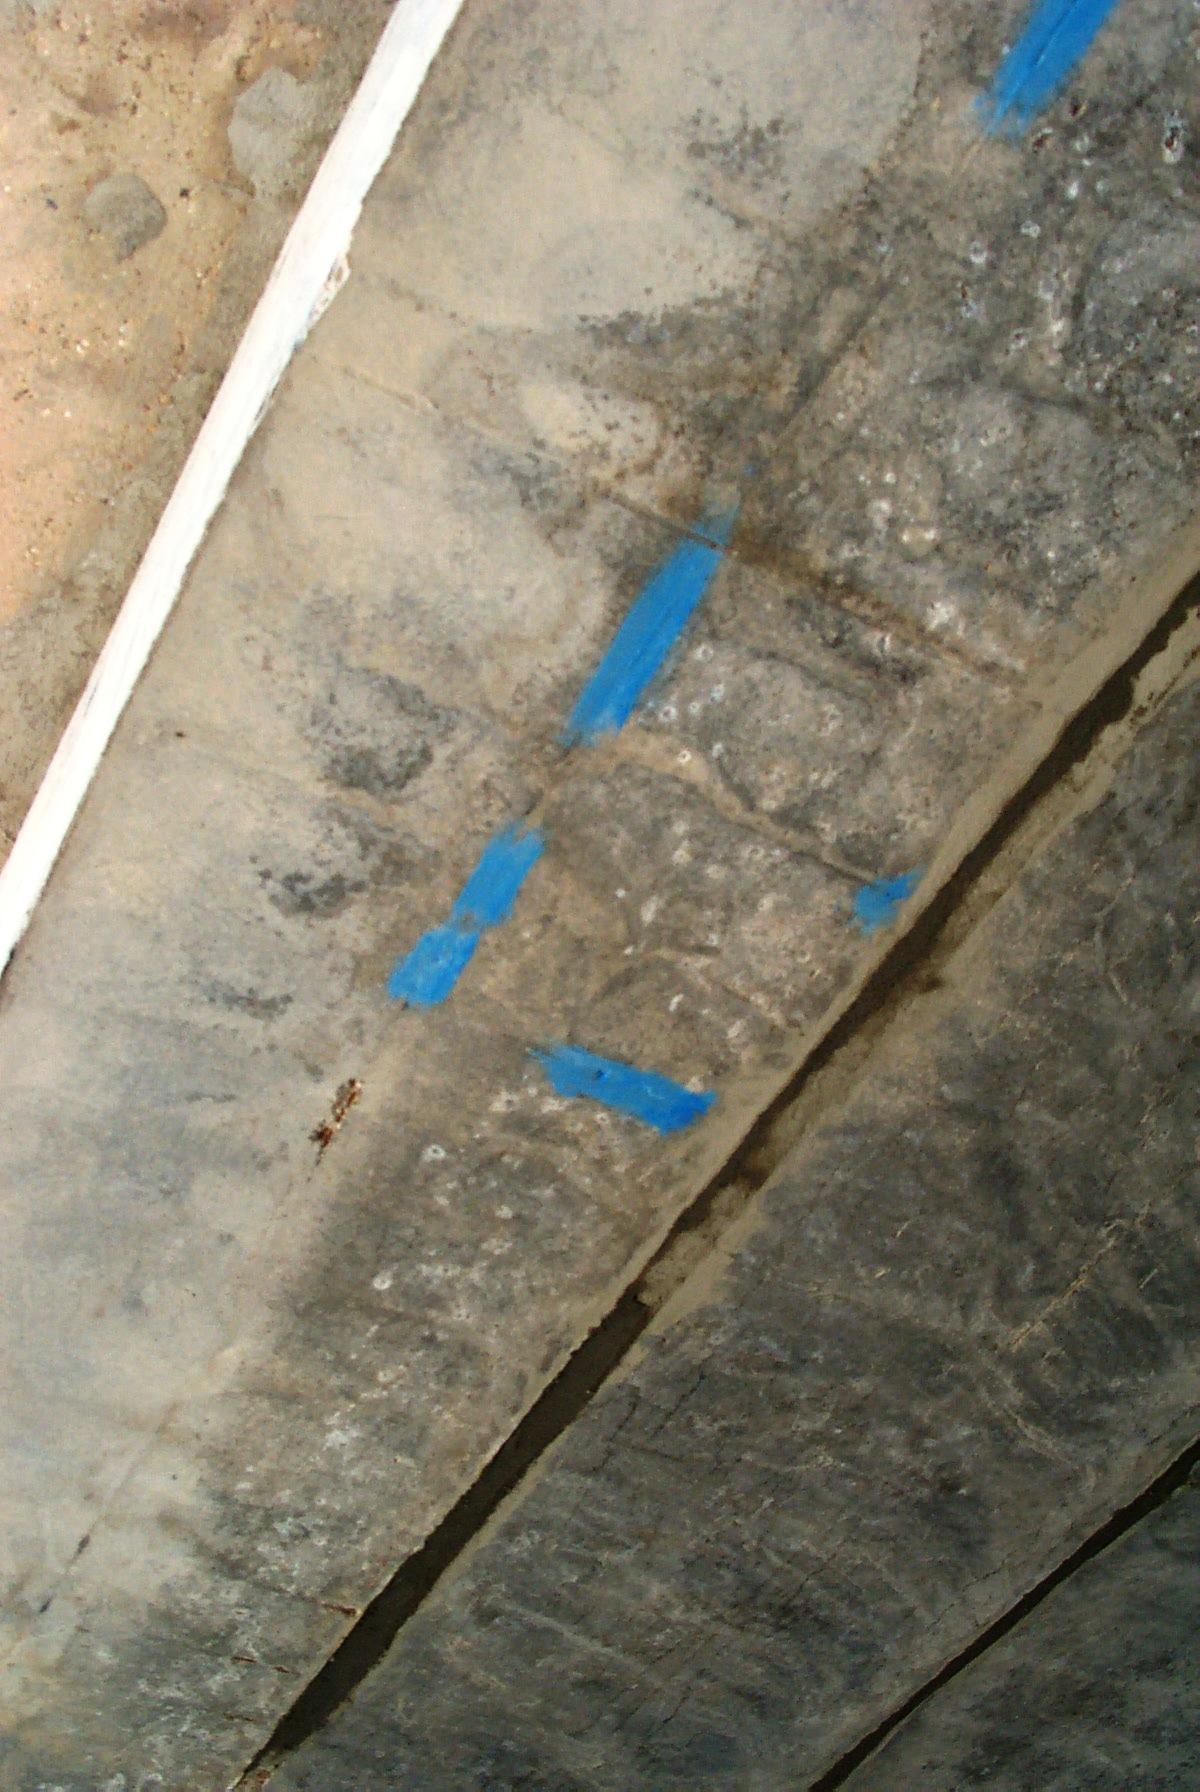 Reparatii pod (DN2), Km. 33 - 028, peste raul Calnistea MAPEI - Poza 110